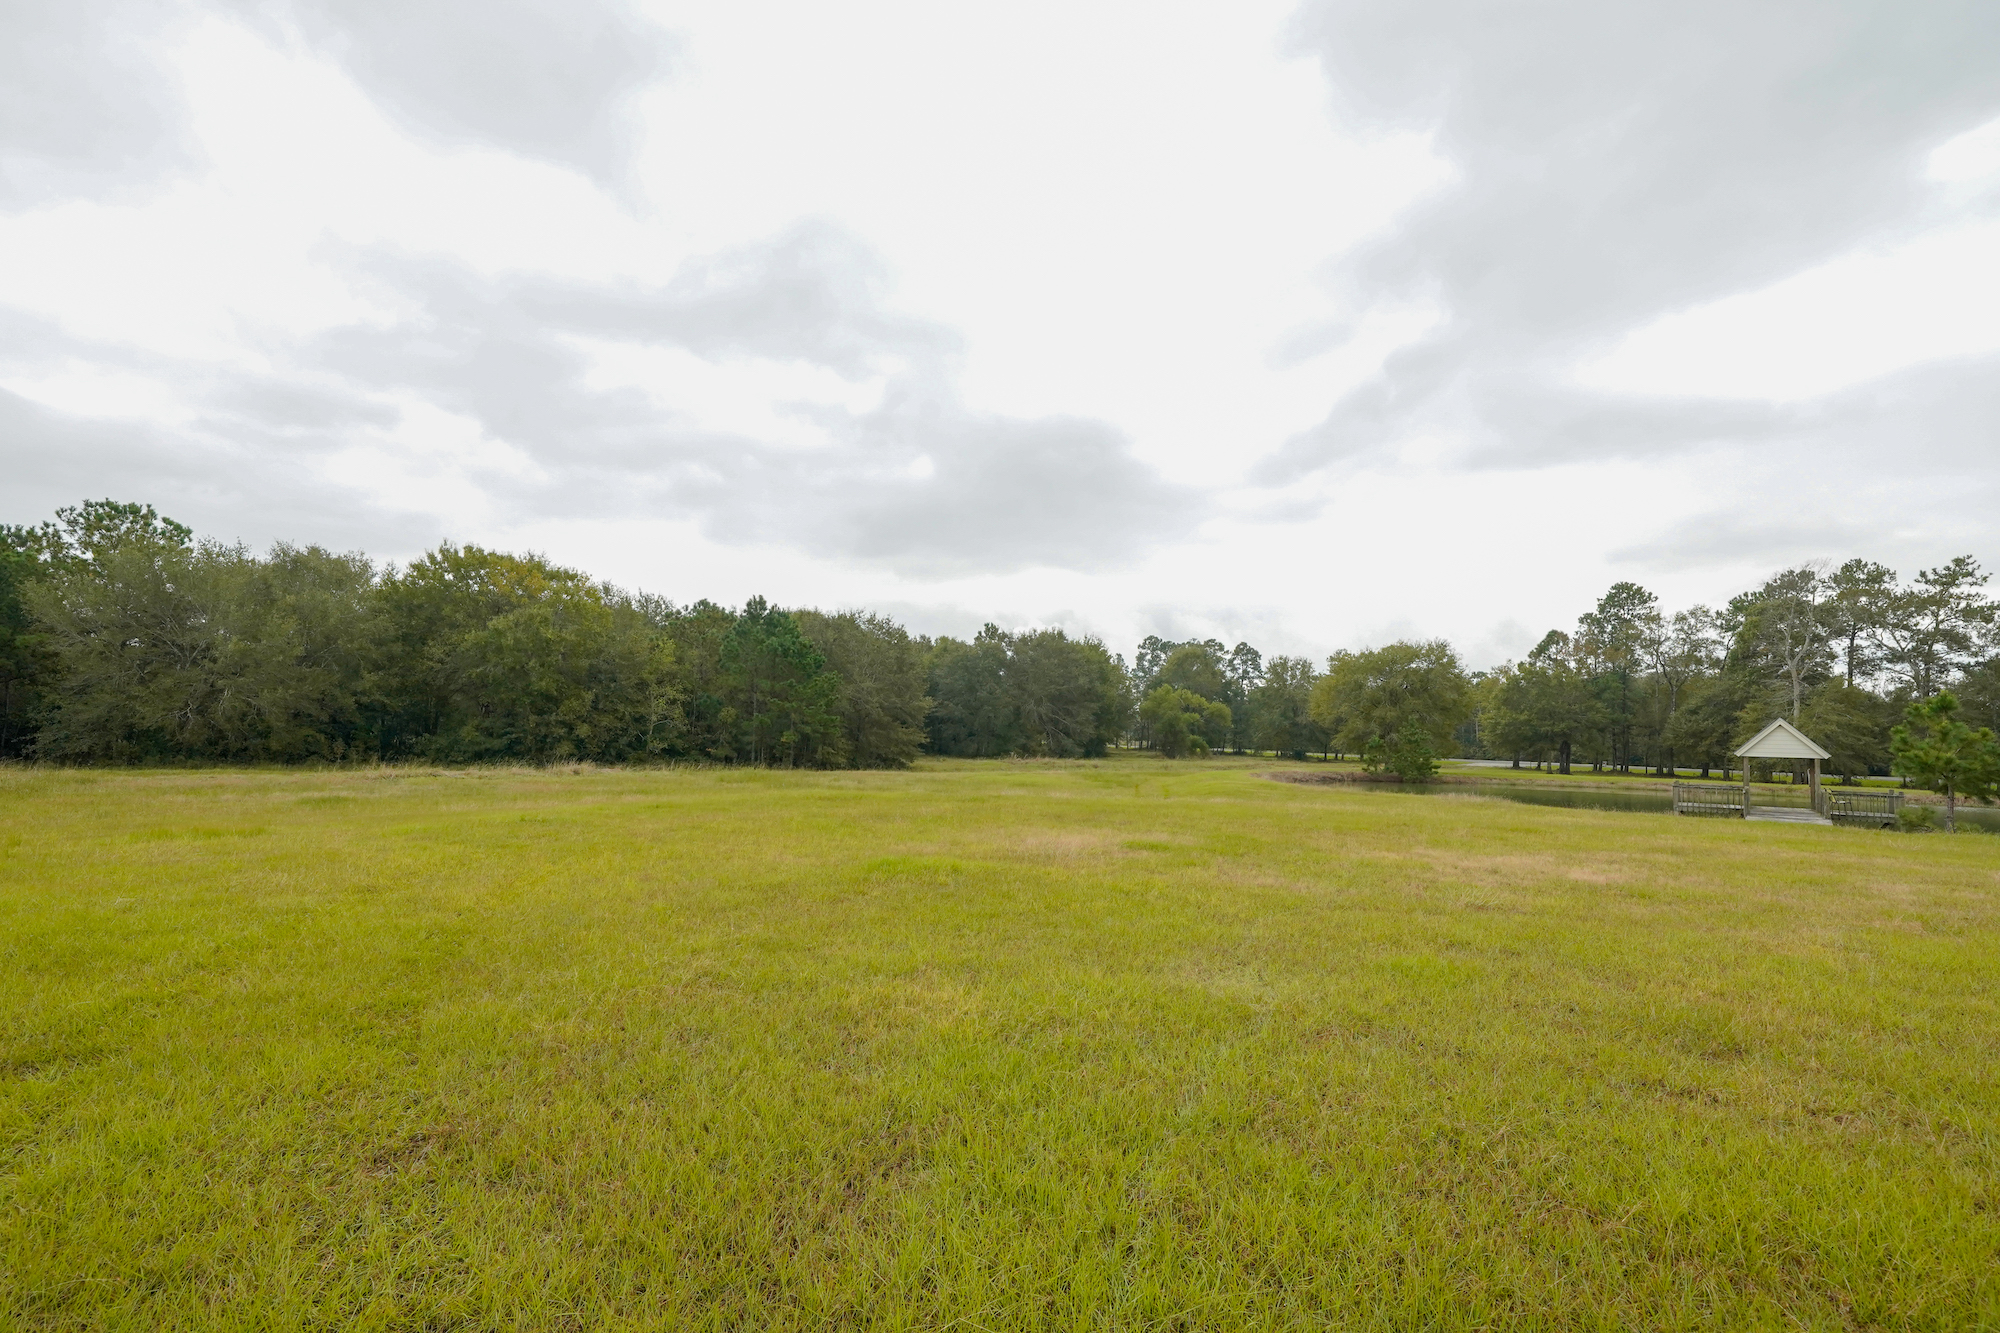 Jefferson County Development Land - Image 18 of 36